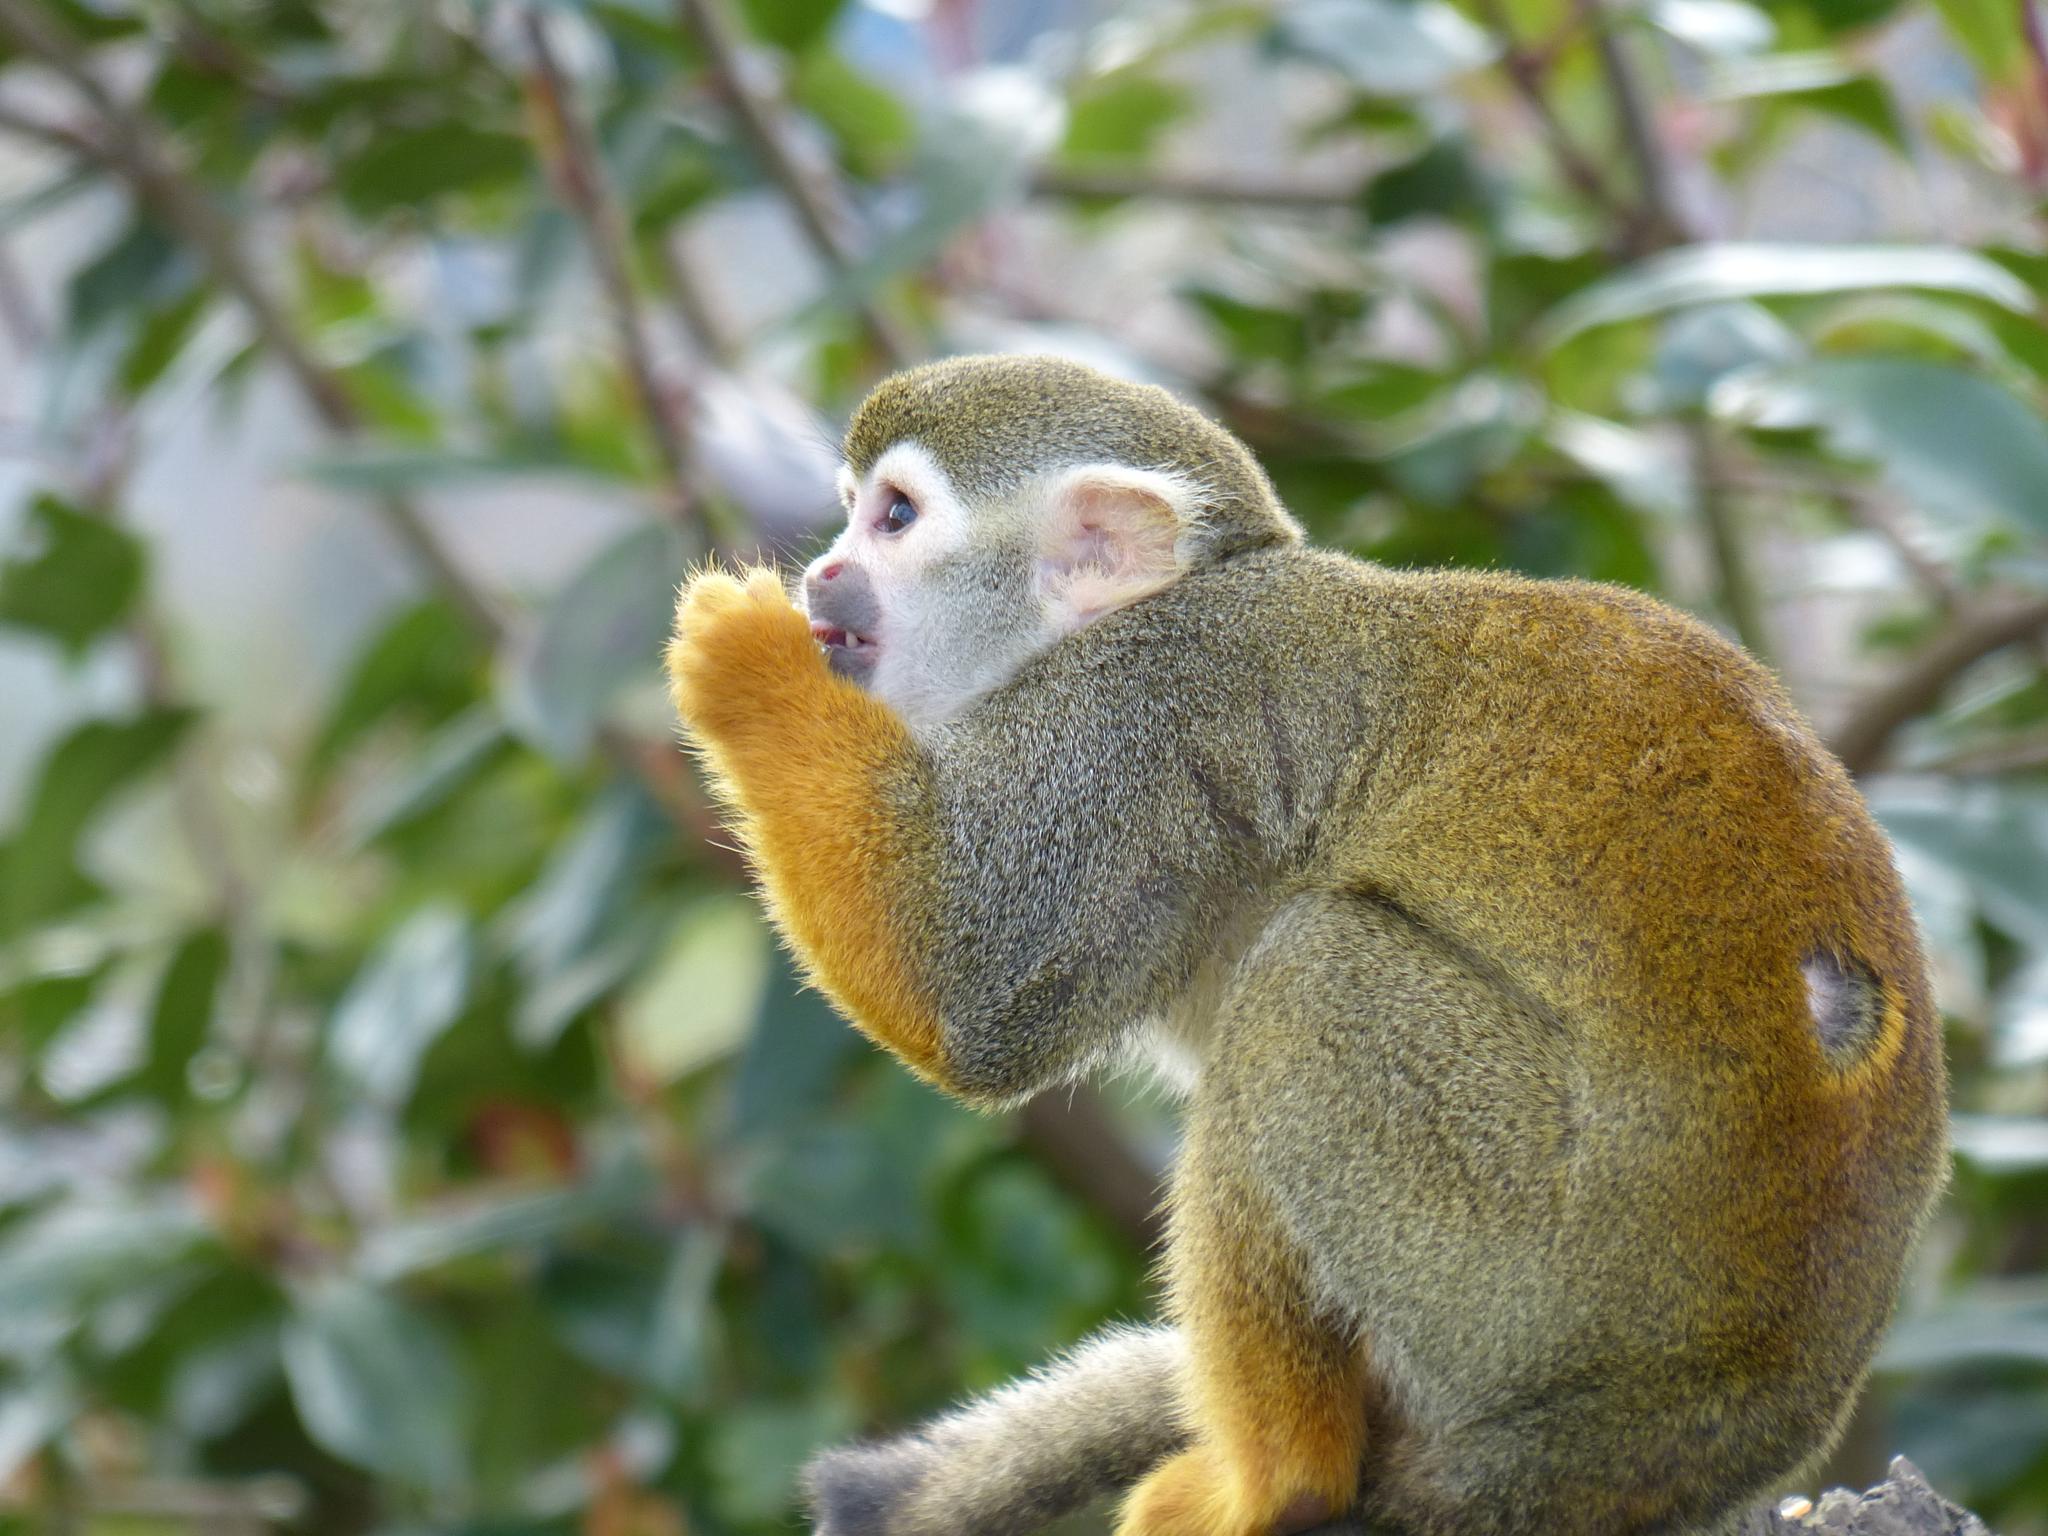 Monkey by wendy.west.9212